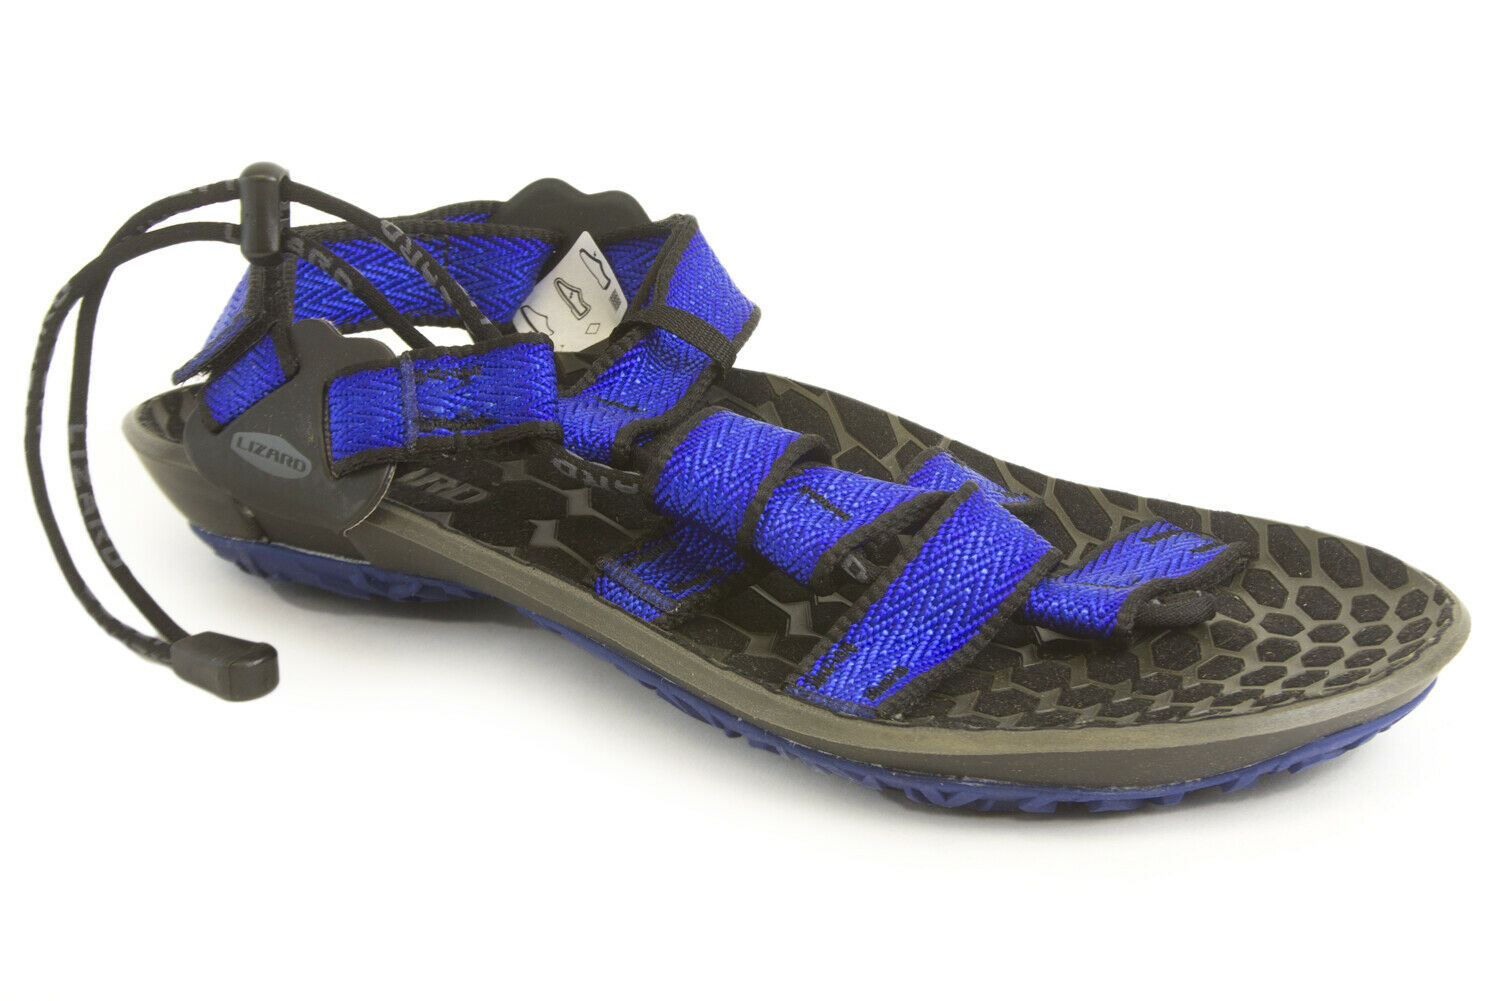 Lizard Footwear Hombre Azul Kyota H2o Sandals Nuevo